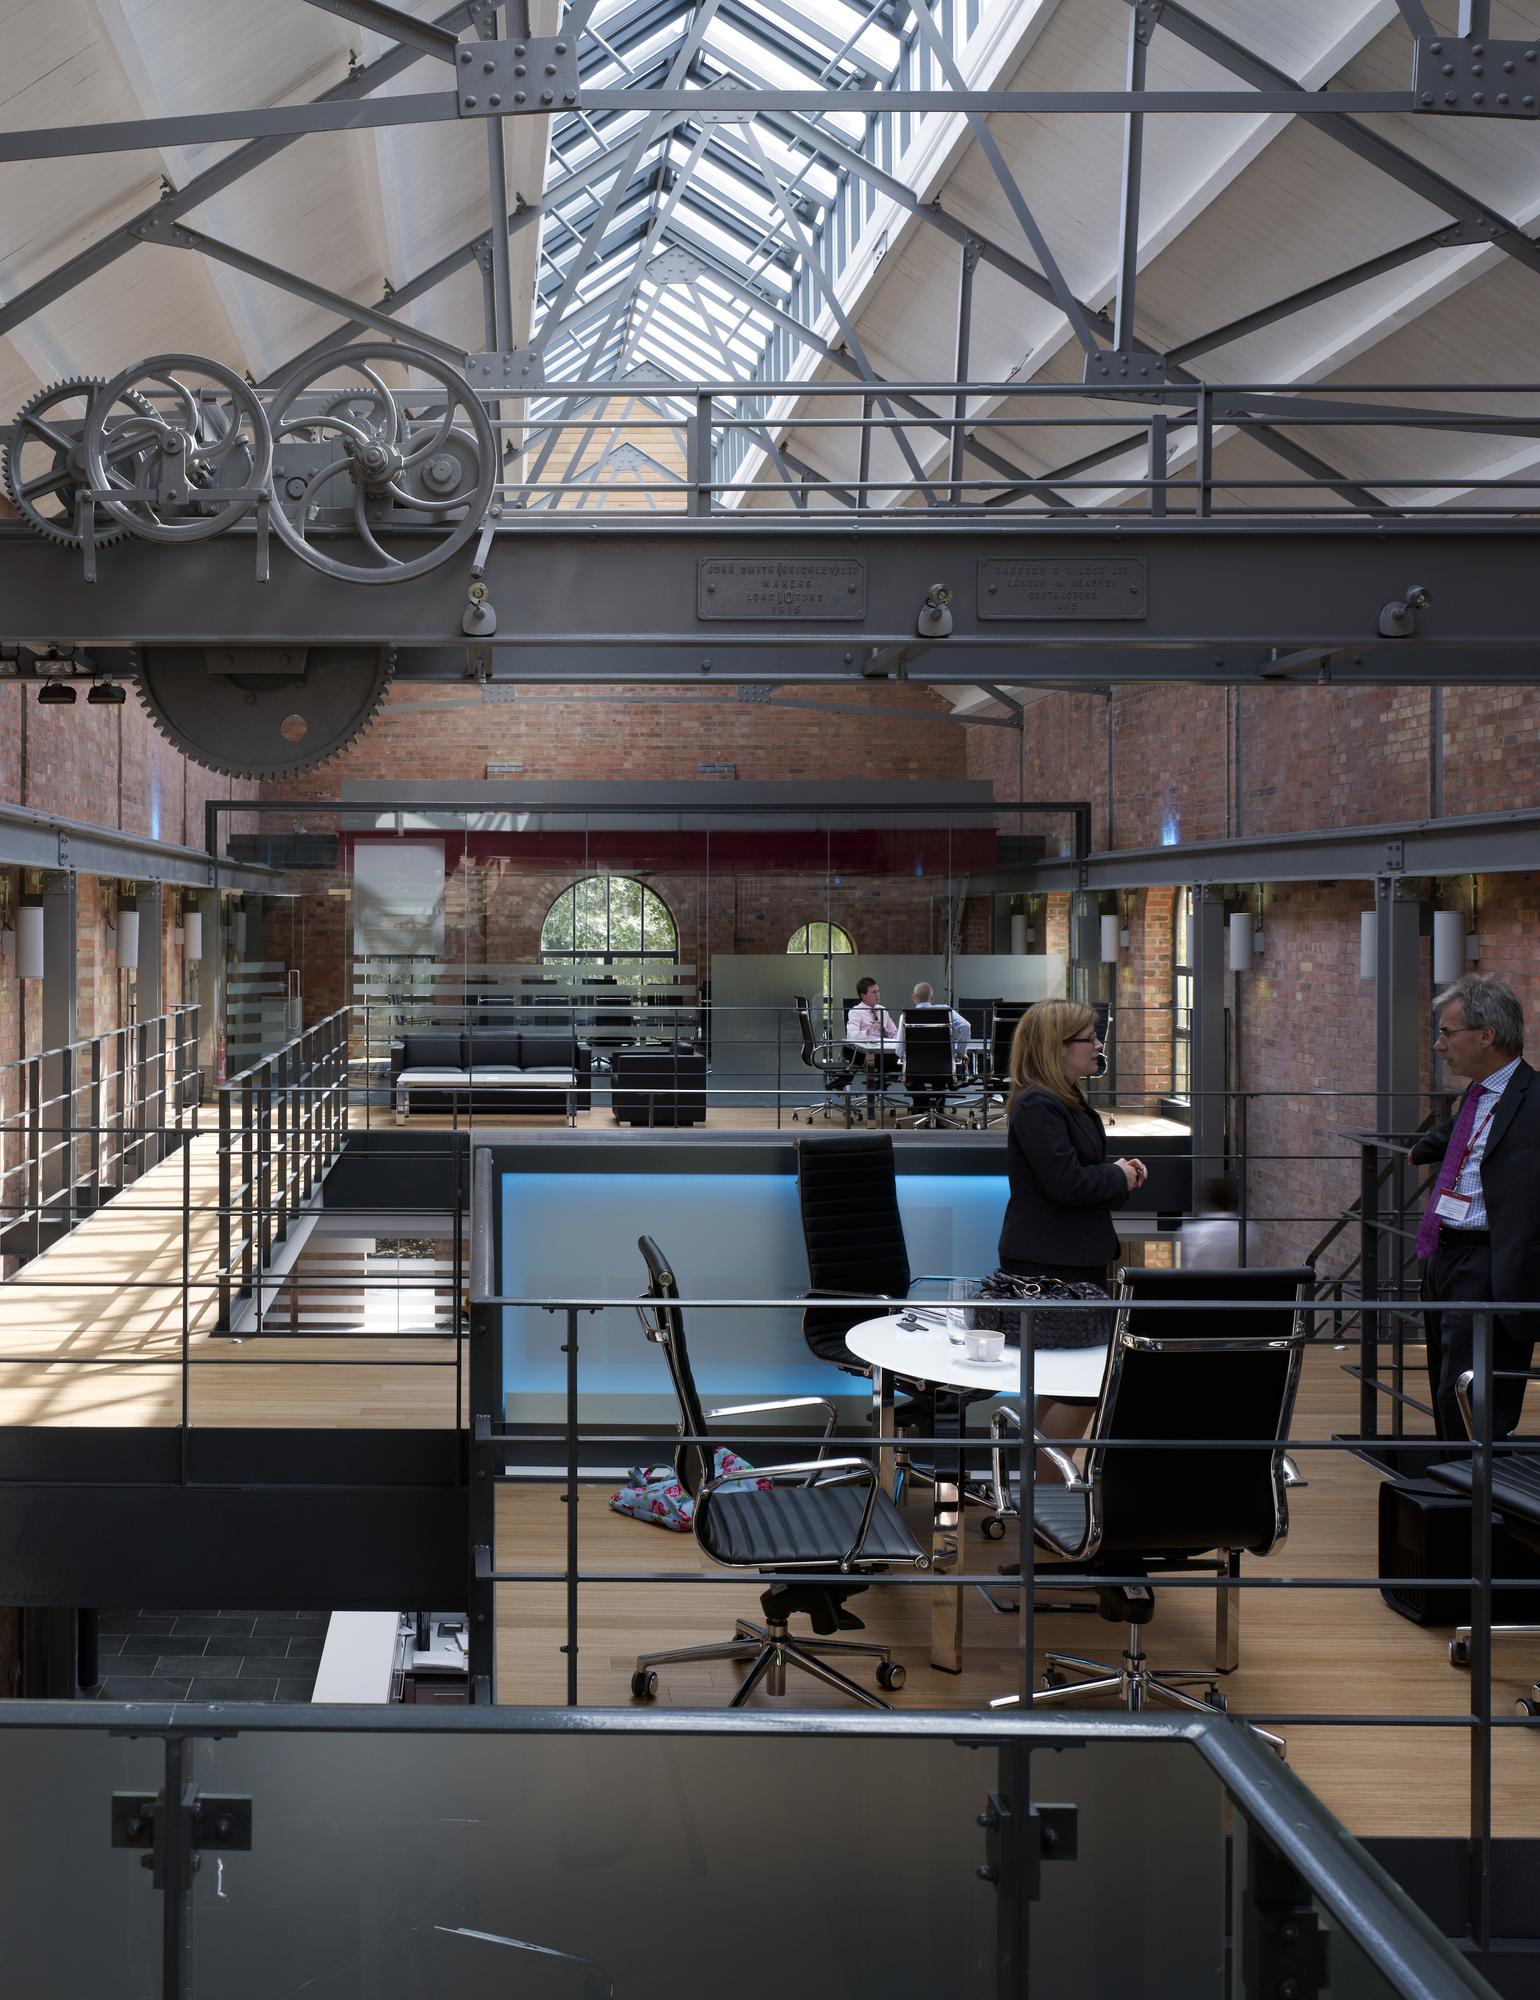 Gunpowder Mill / Pollard Thomas Edwards Architects